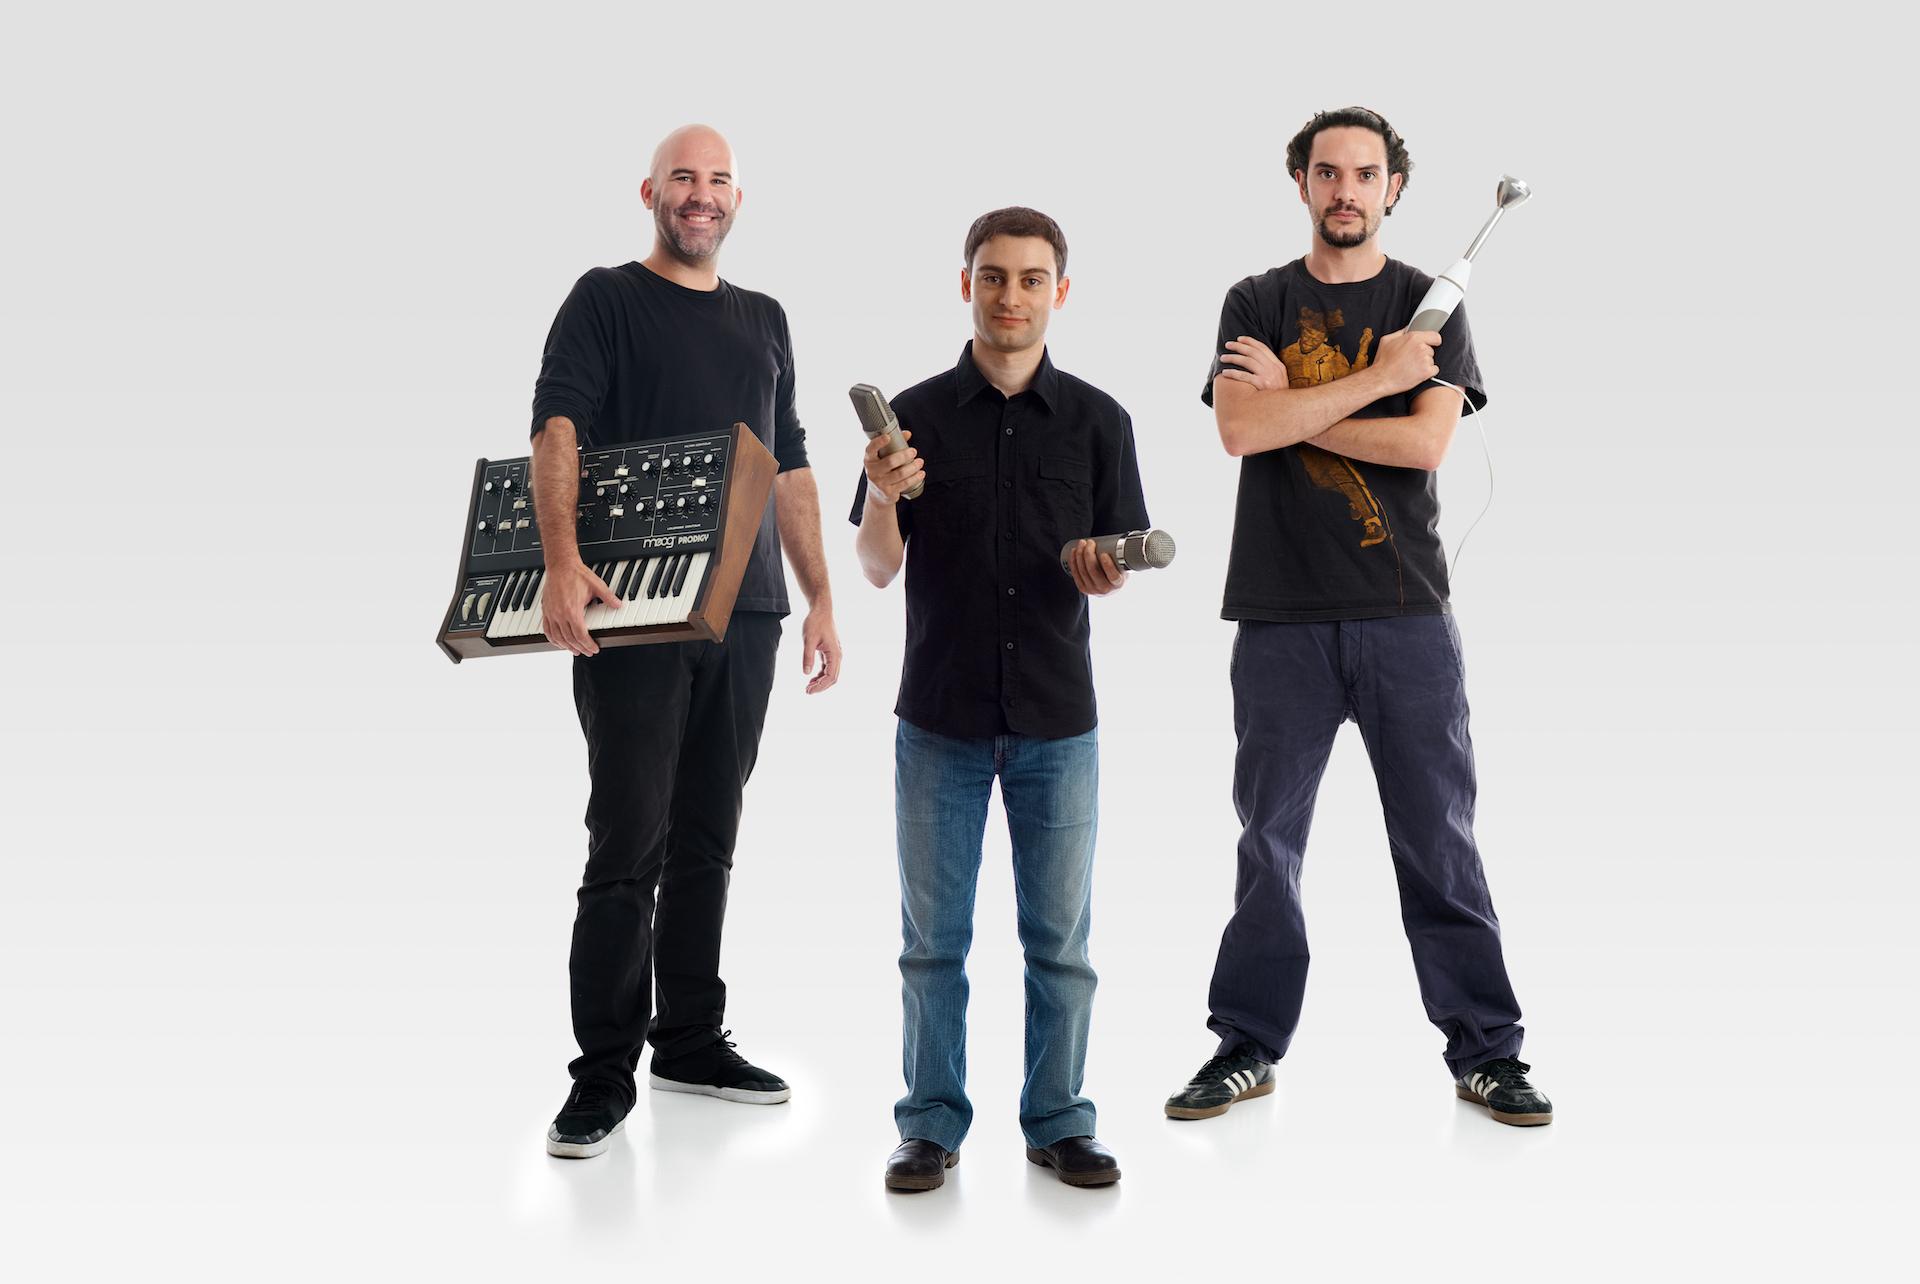 Jordi, Lluís and Javi - Technical Department